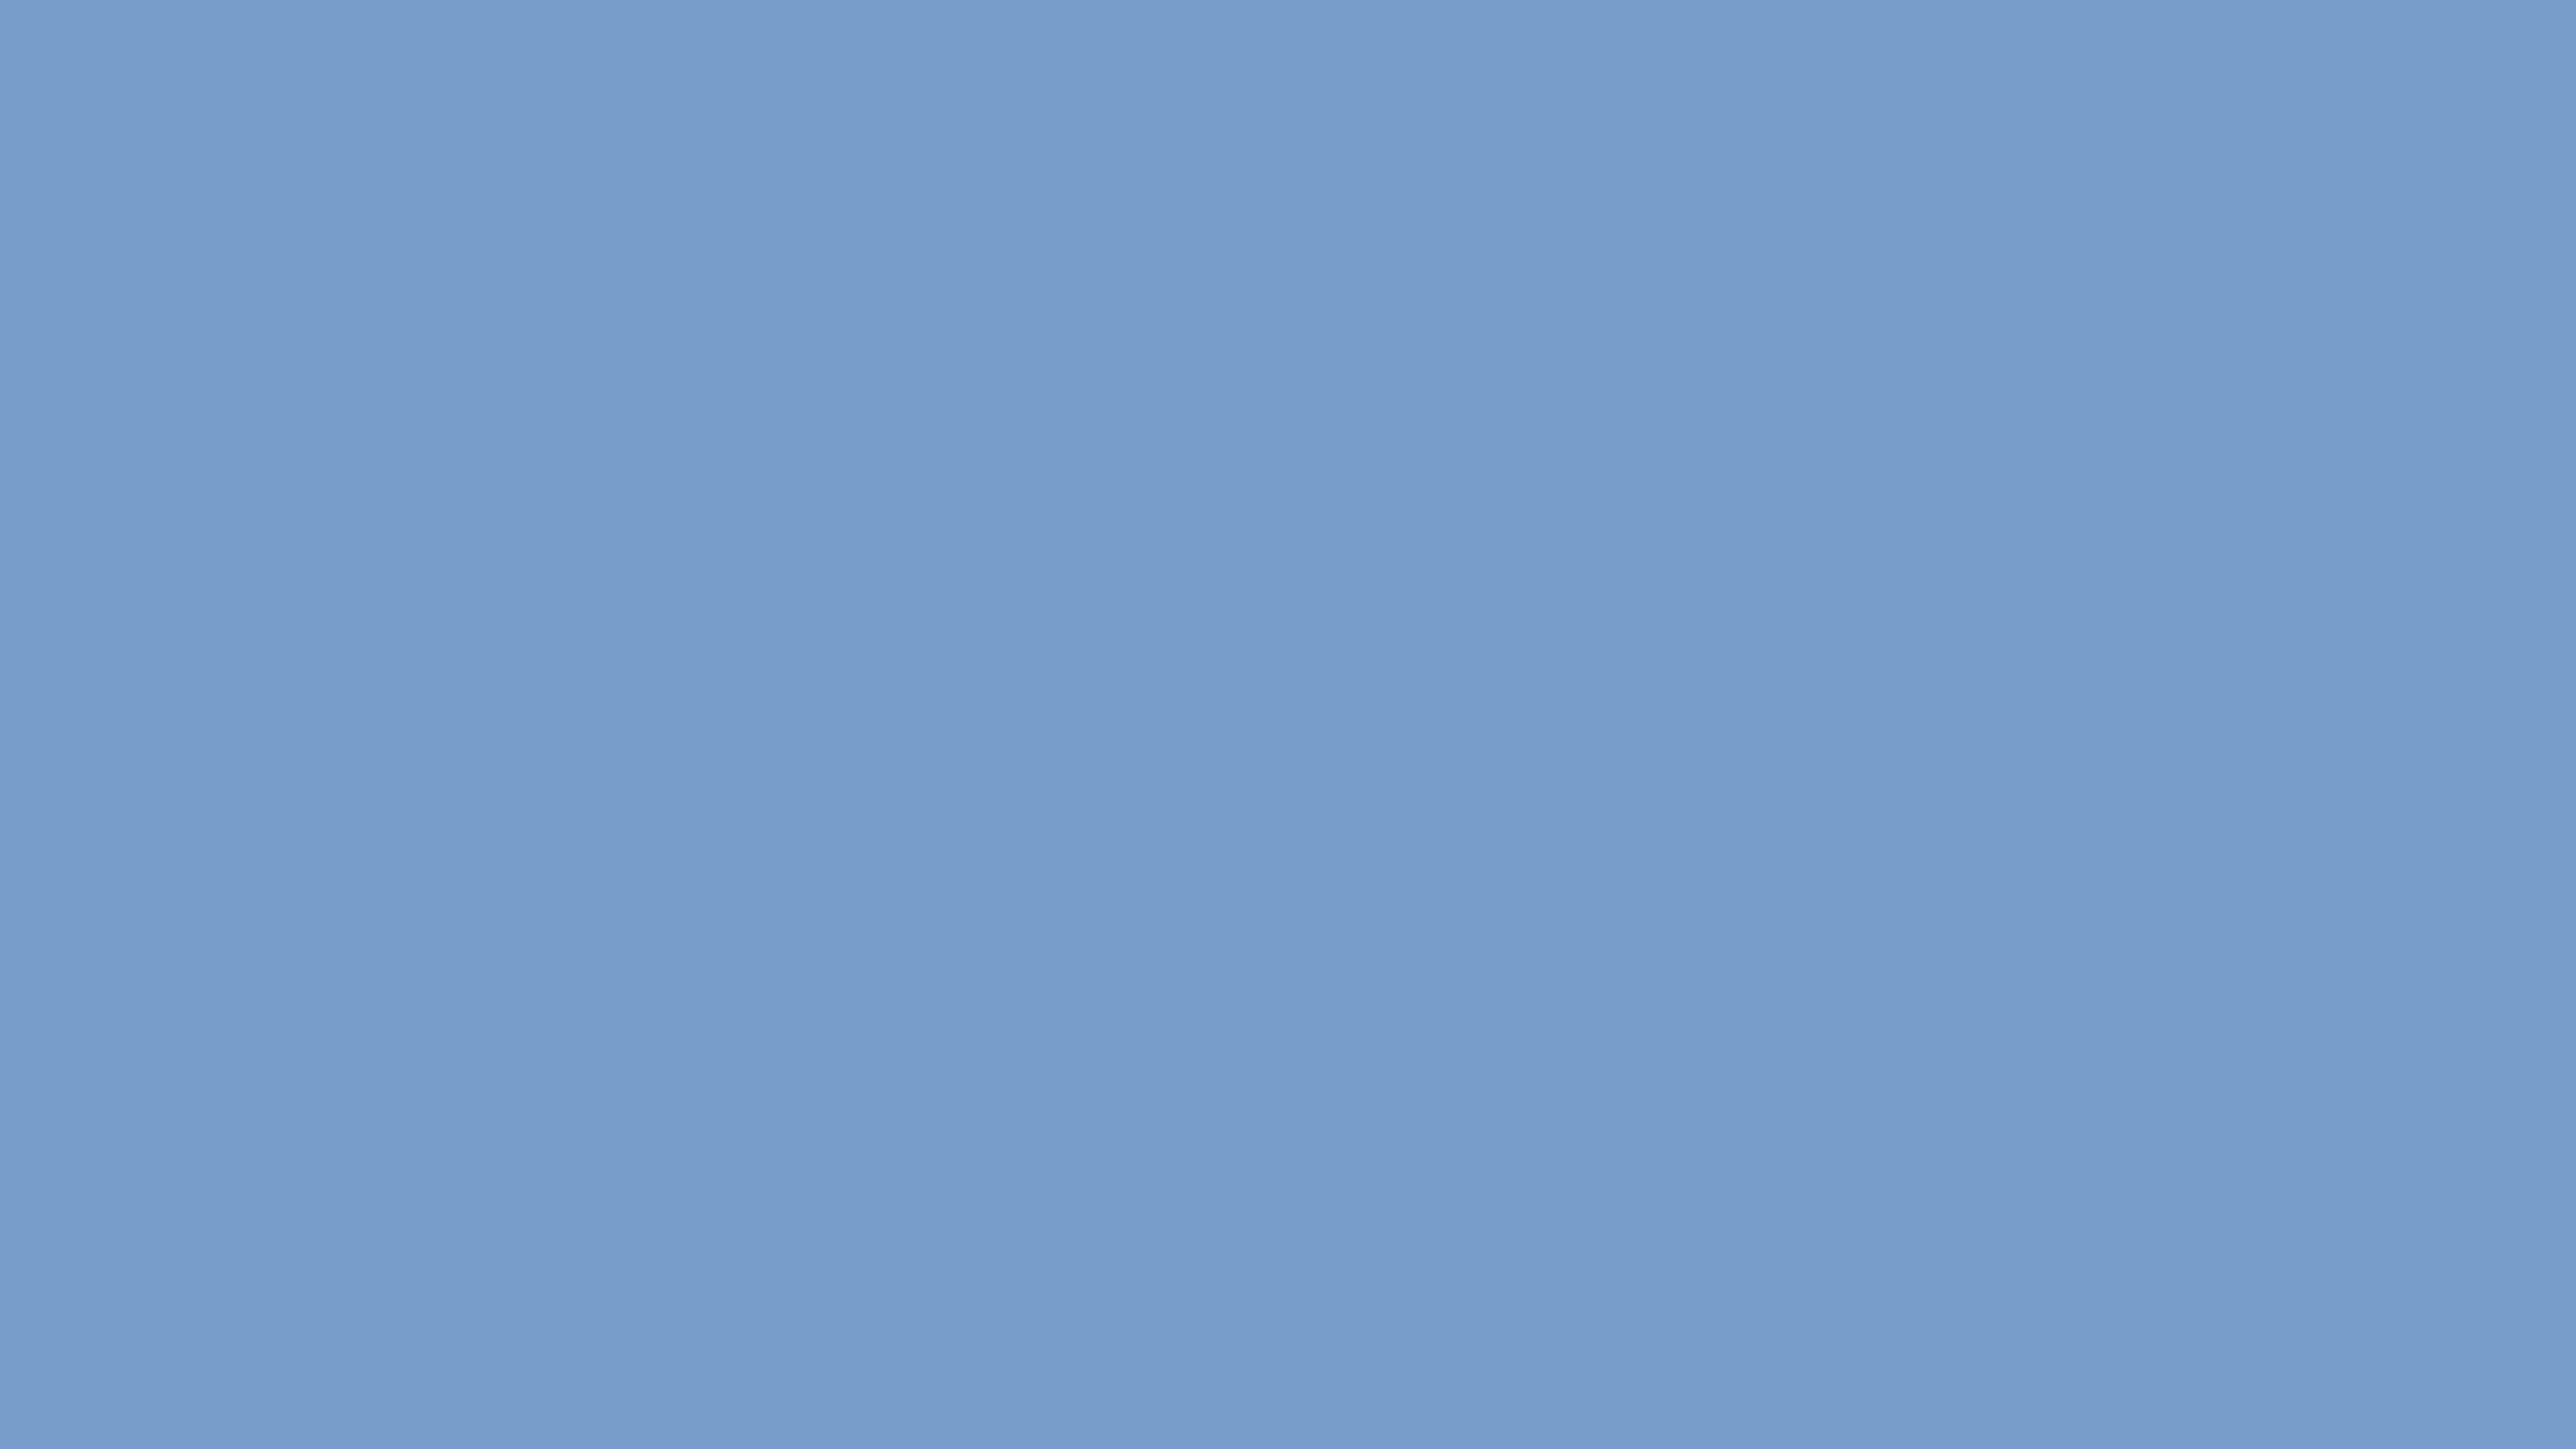 4096x2304 Dark Pastel Blue Solid Color Background